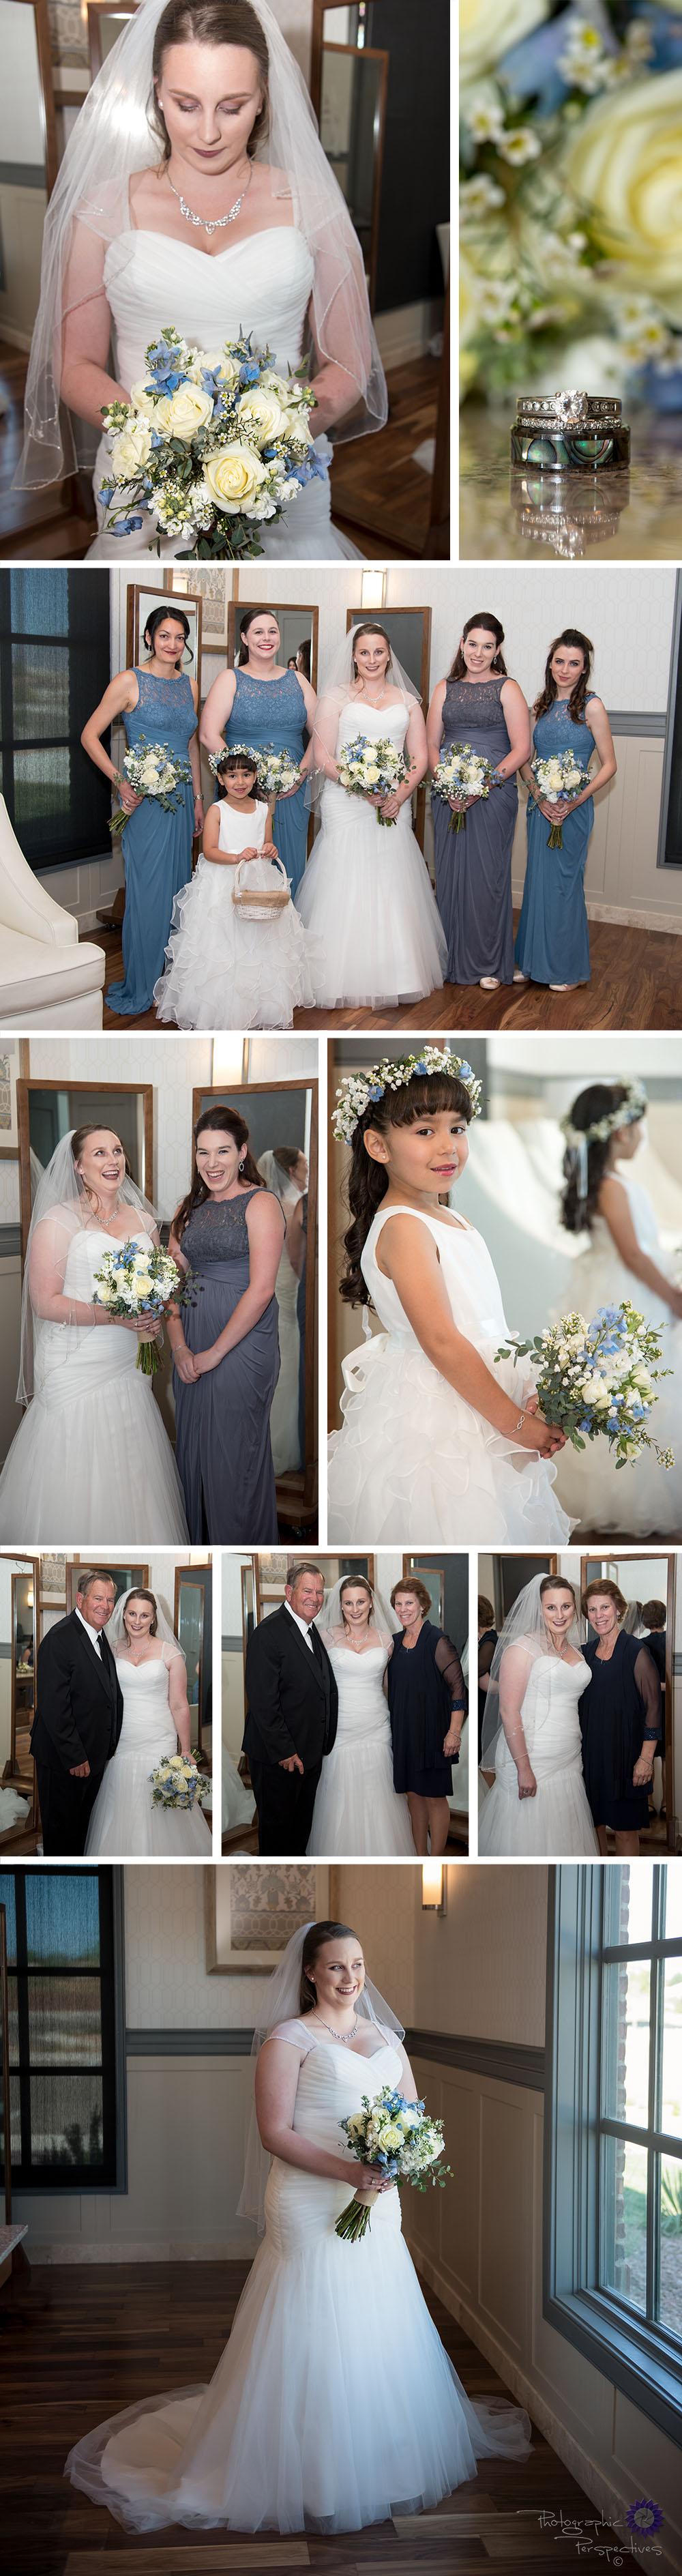 Noahs' Event Venue | Albuquerque Wedding Photographers | David's Bridal | New Mexico Wedding